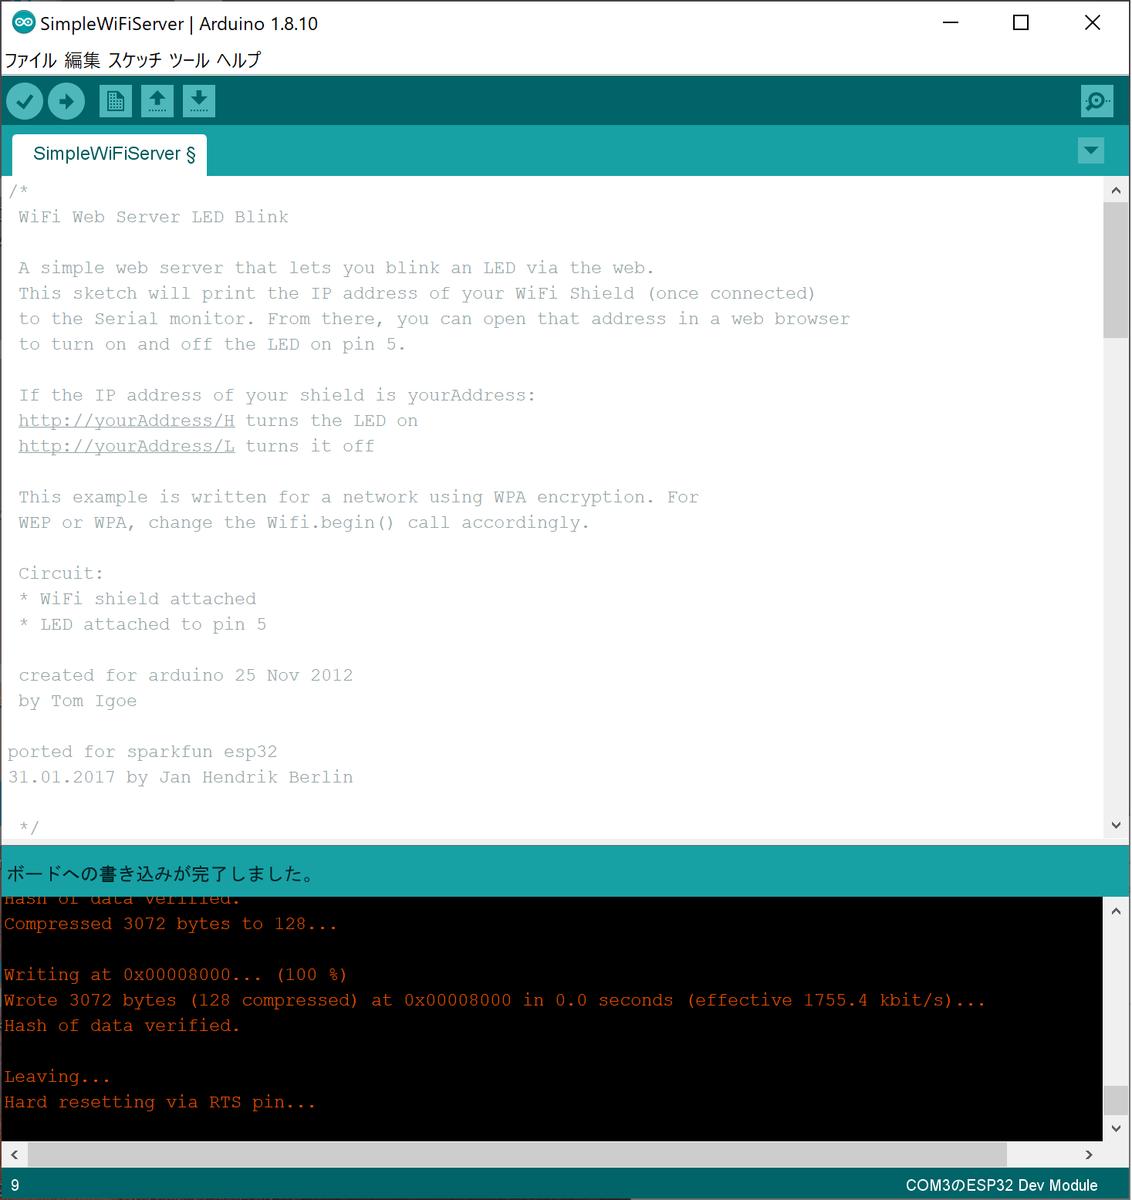 f:id:opensourcetech:20200112202706p:plain